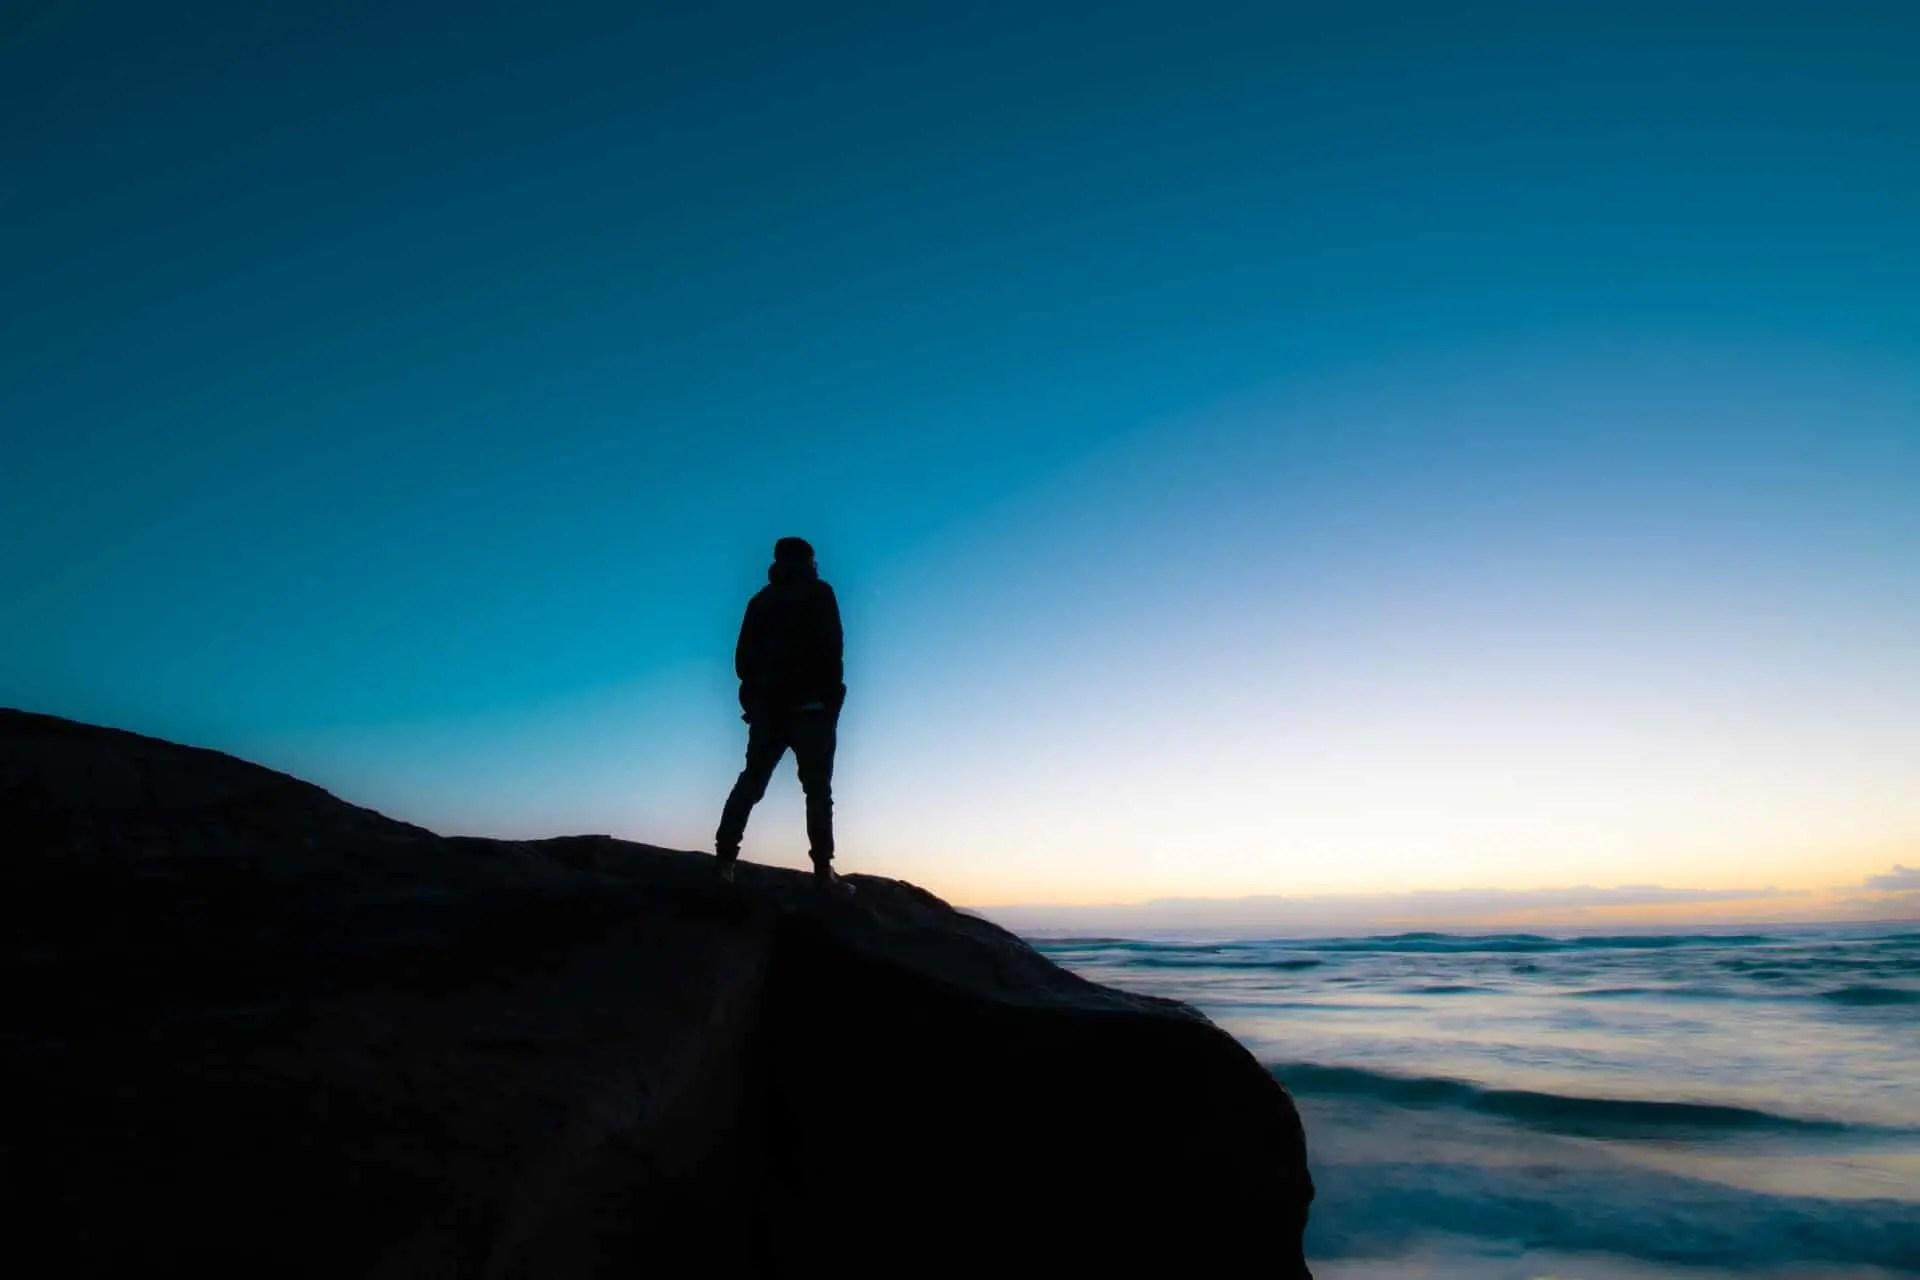 Man Overlooking Sea